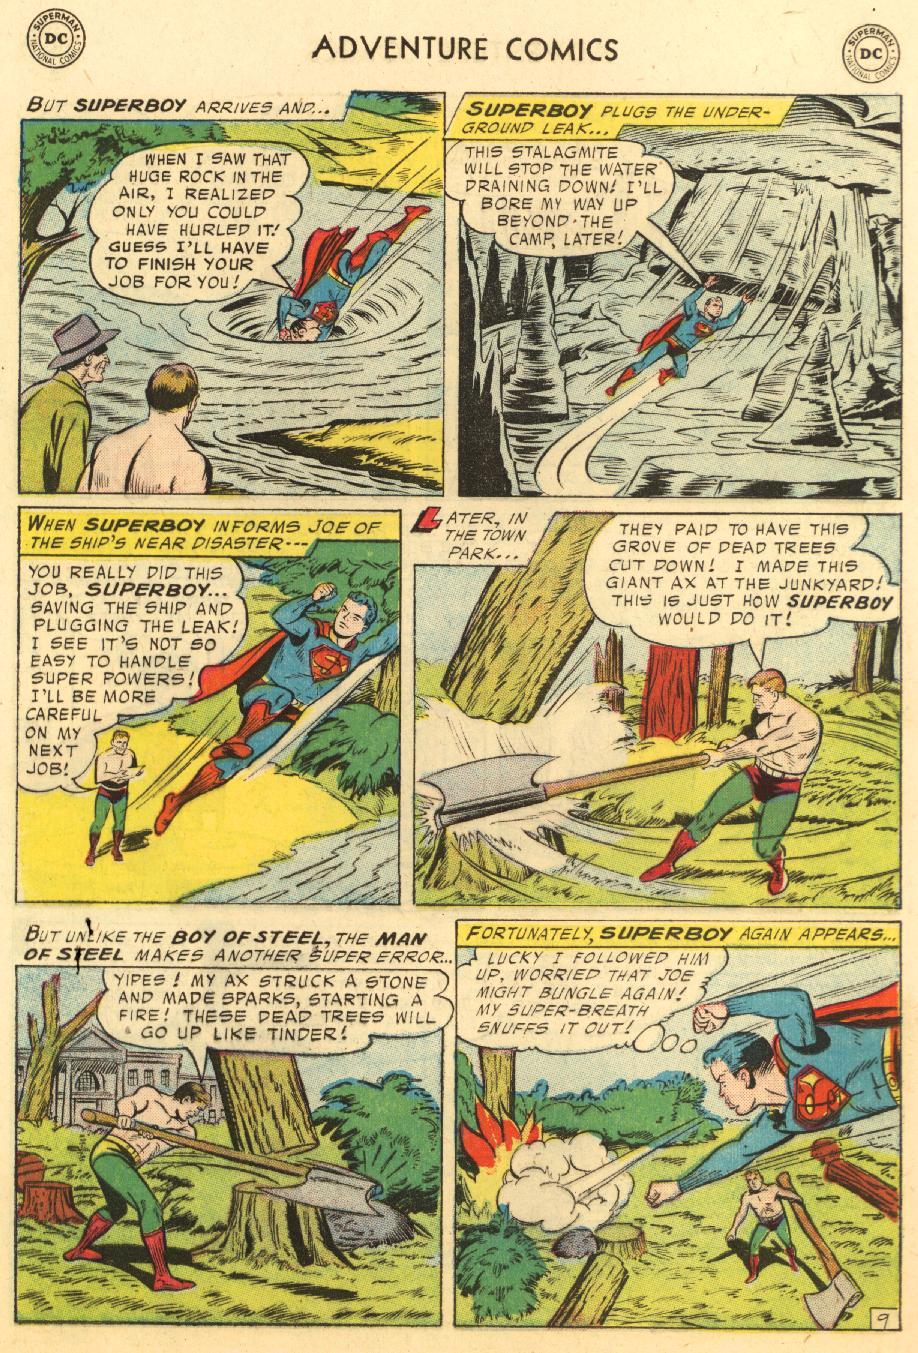 Read online Adventure Comics (1938) comic -  Issue #233 - 11